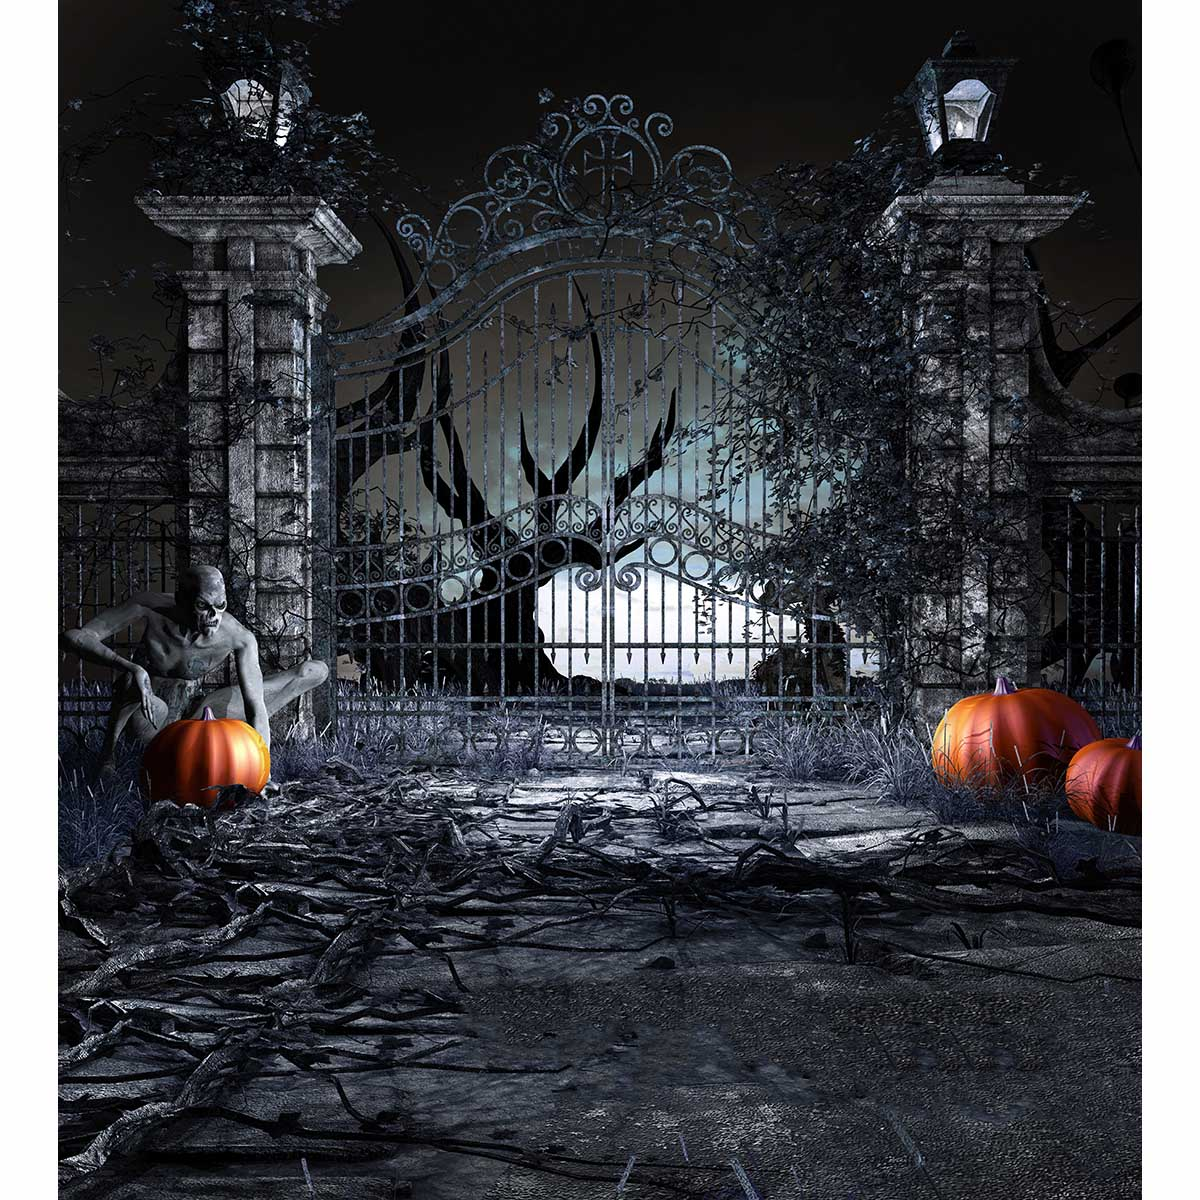 allenjoy photography background dark horrible zombie pumpkin vintage door halloween theme backdrop professional photo studio in background from consumer - Halloween Theme Pictures